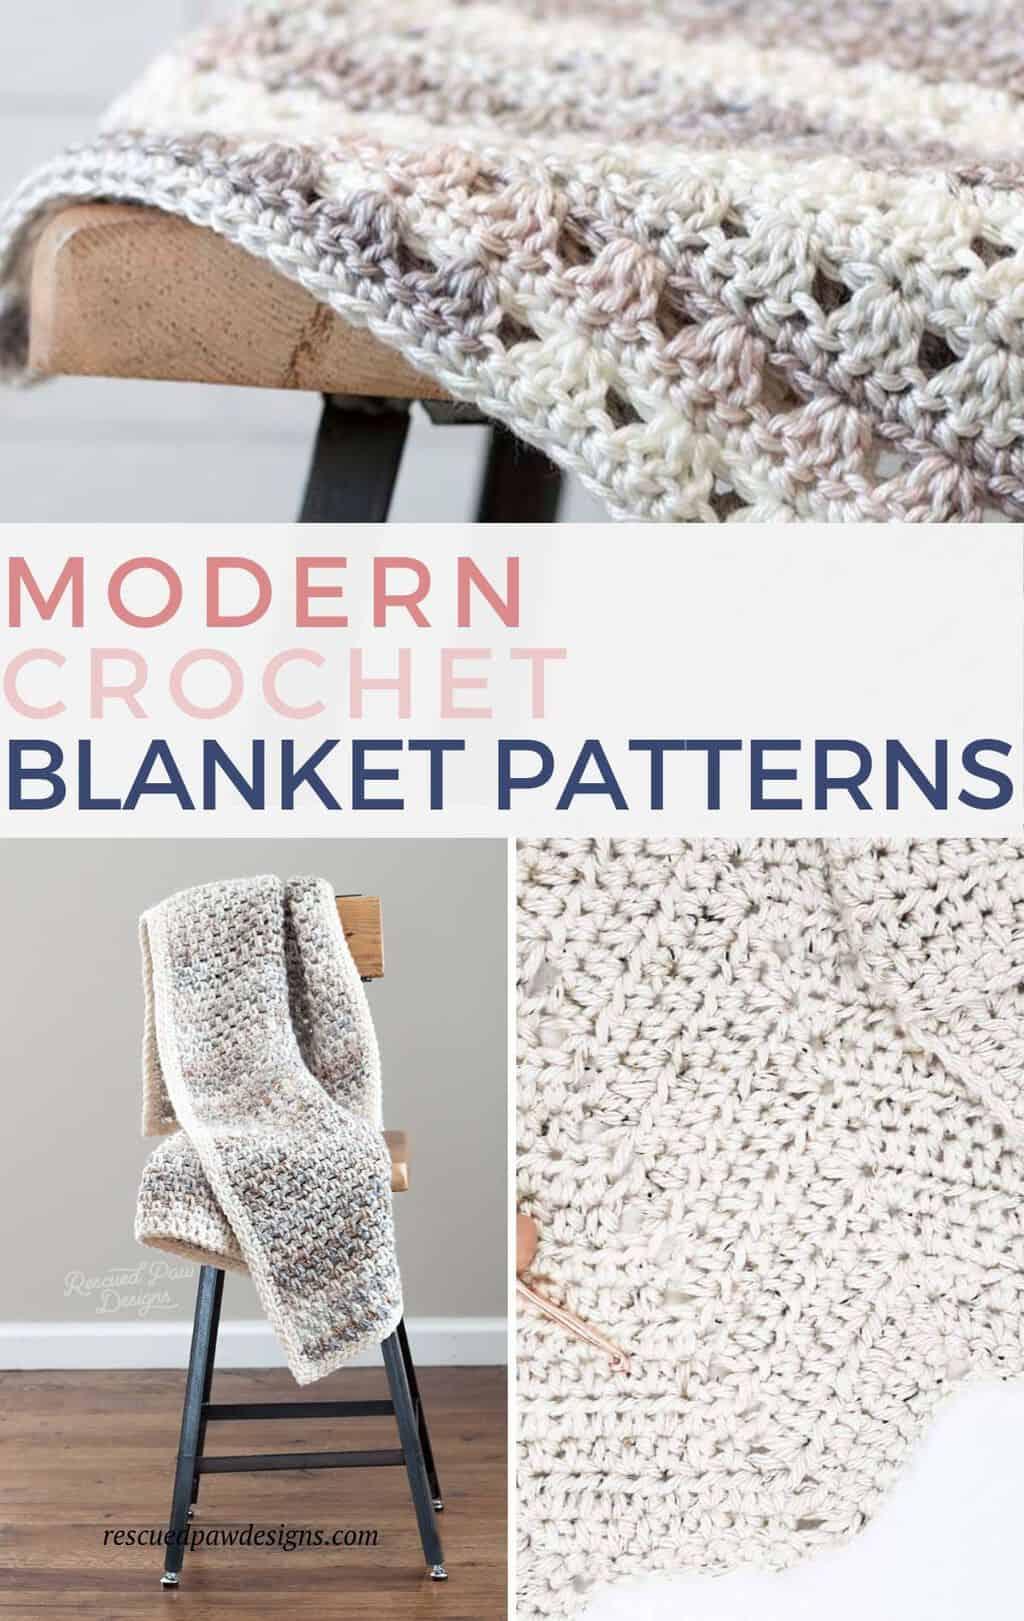 Modern Crochet Blanket Patterns